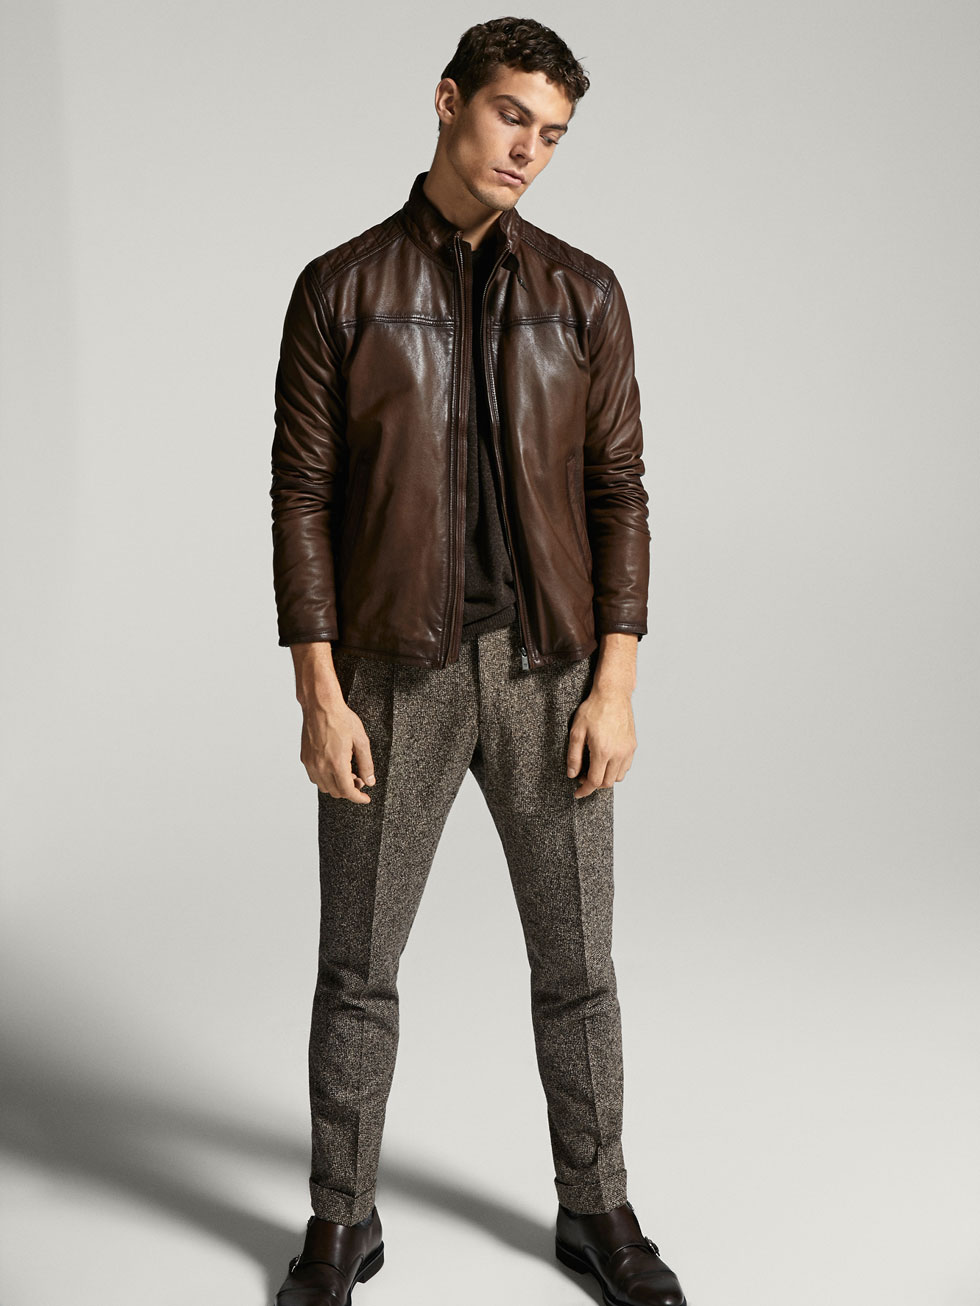 Massimo dutti leather jackets